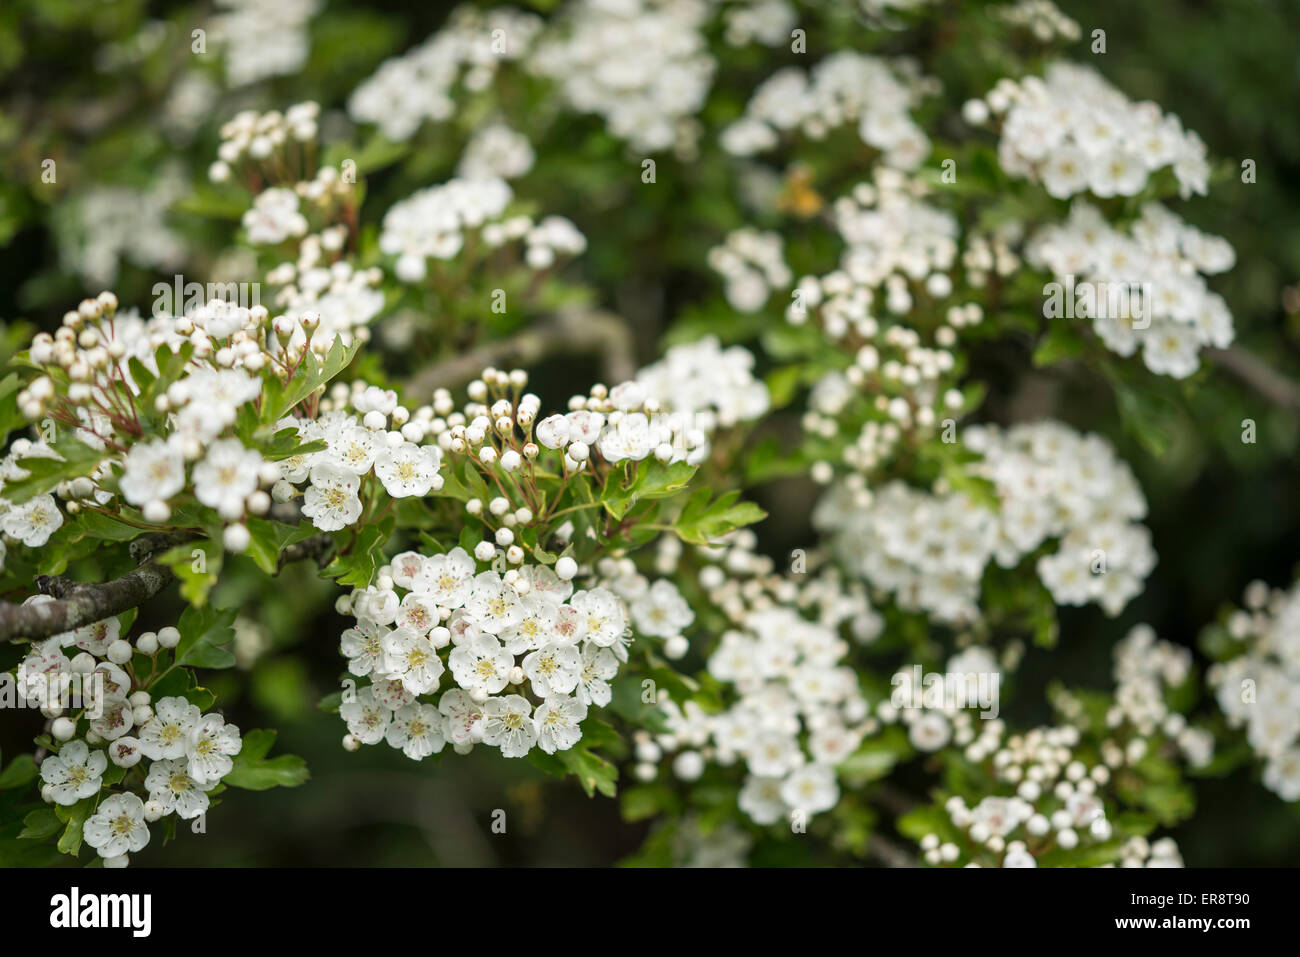 Close Up Of White Hawthorn Flowers Craetegus Monogyna Stock Photo